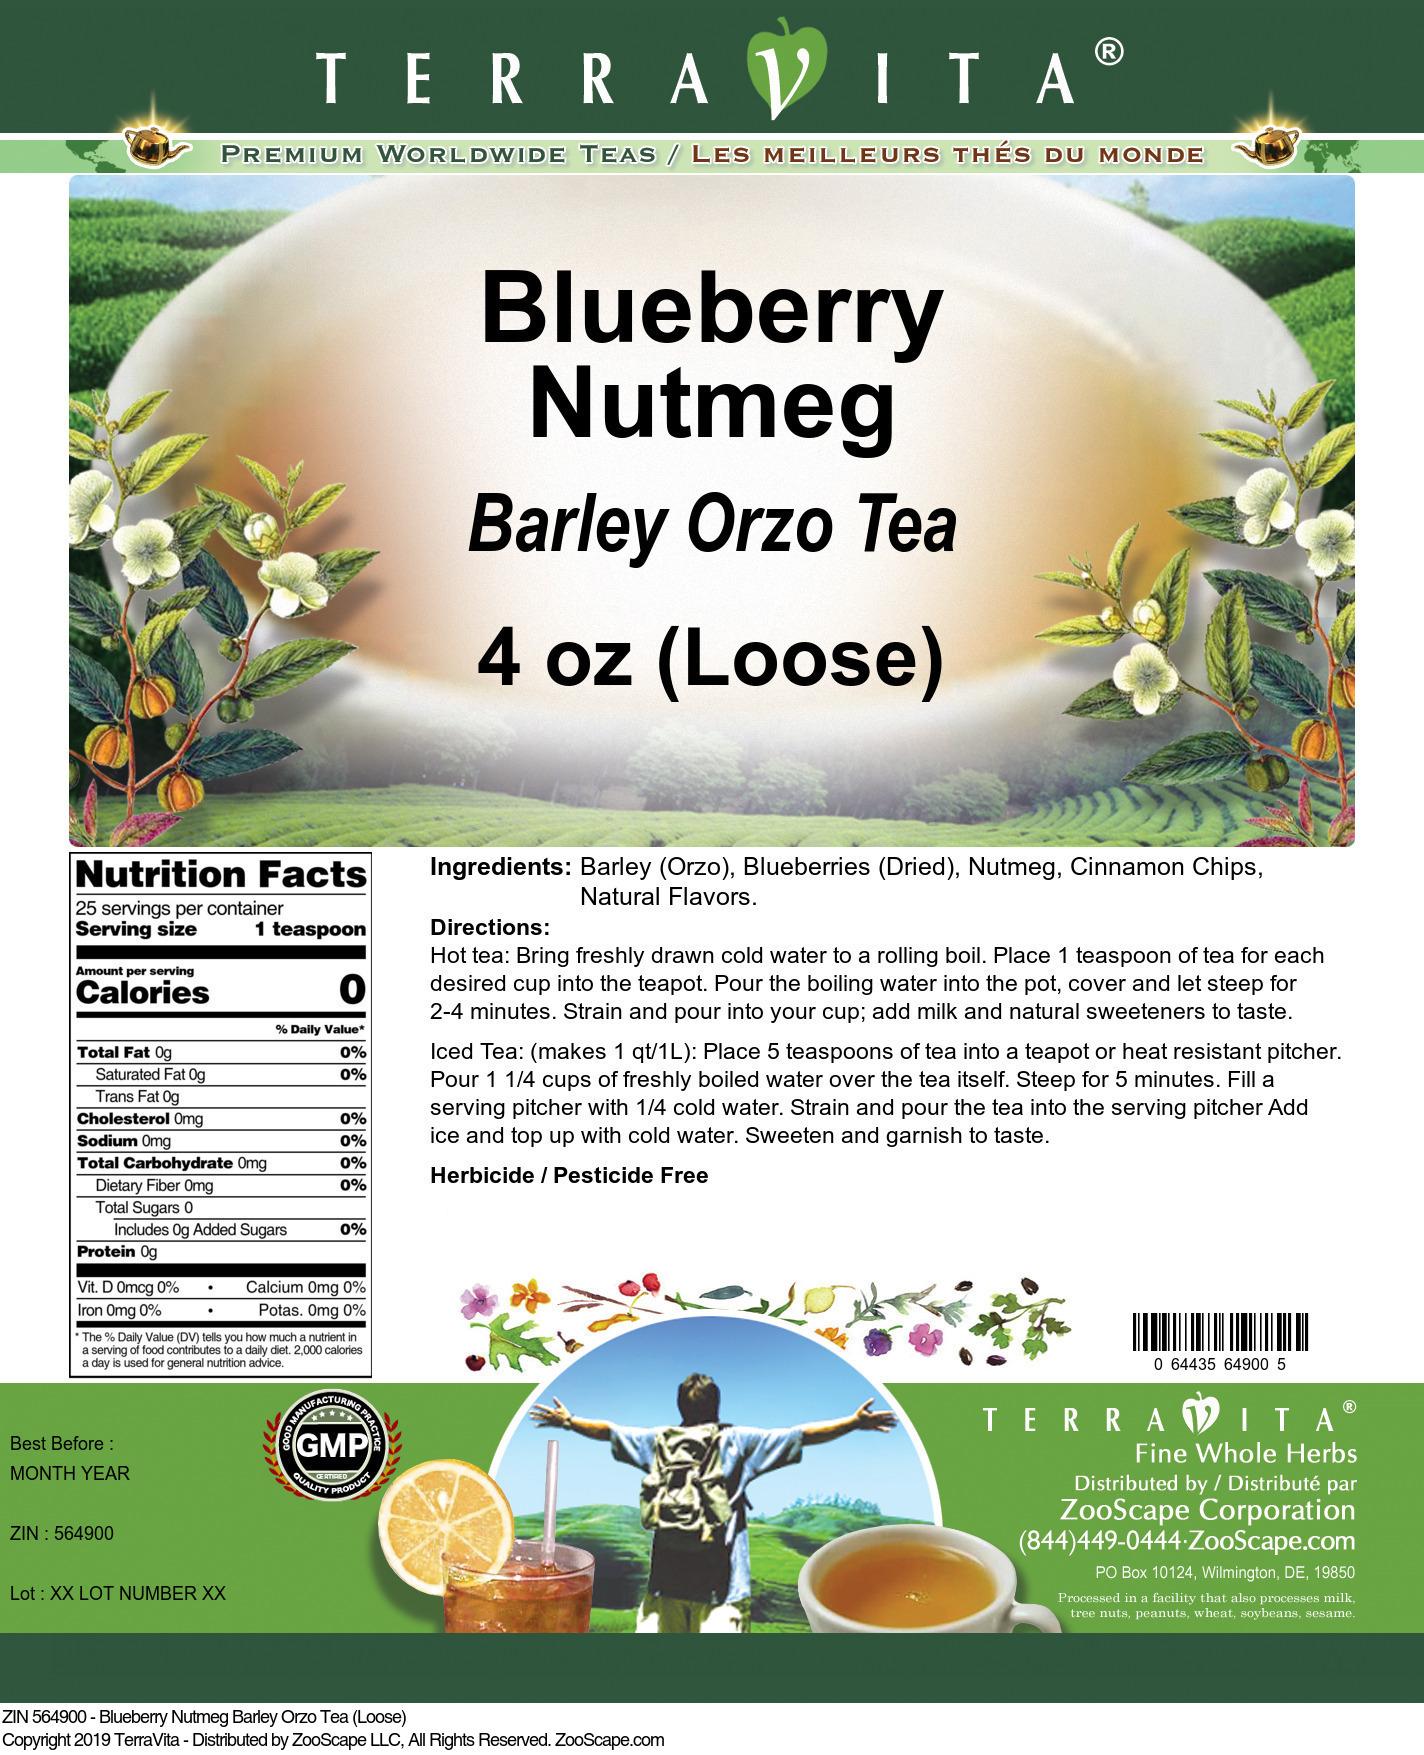 Blueberry Nutmeg Barley Orzo Tea (Loose)